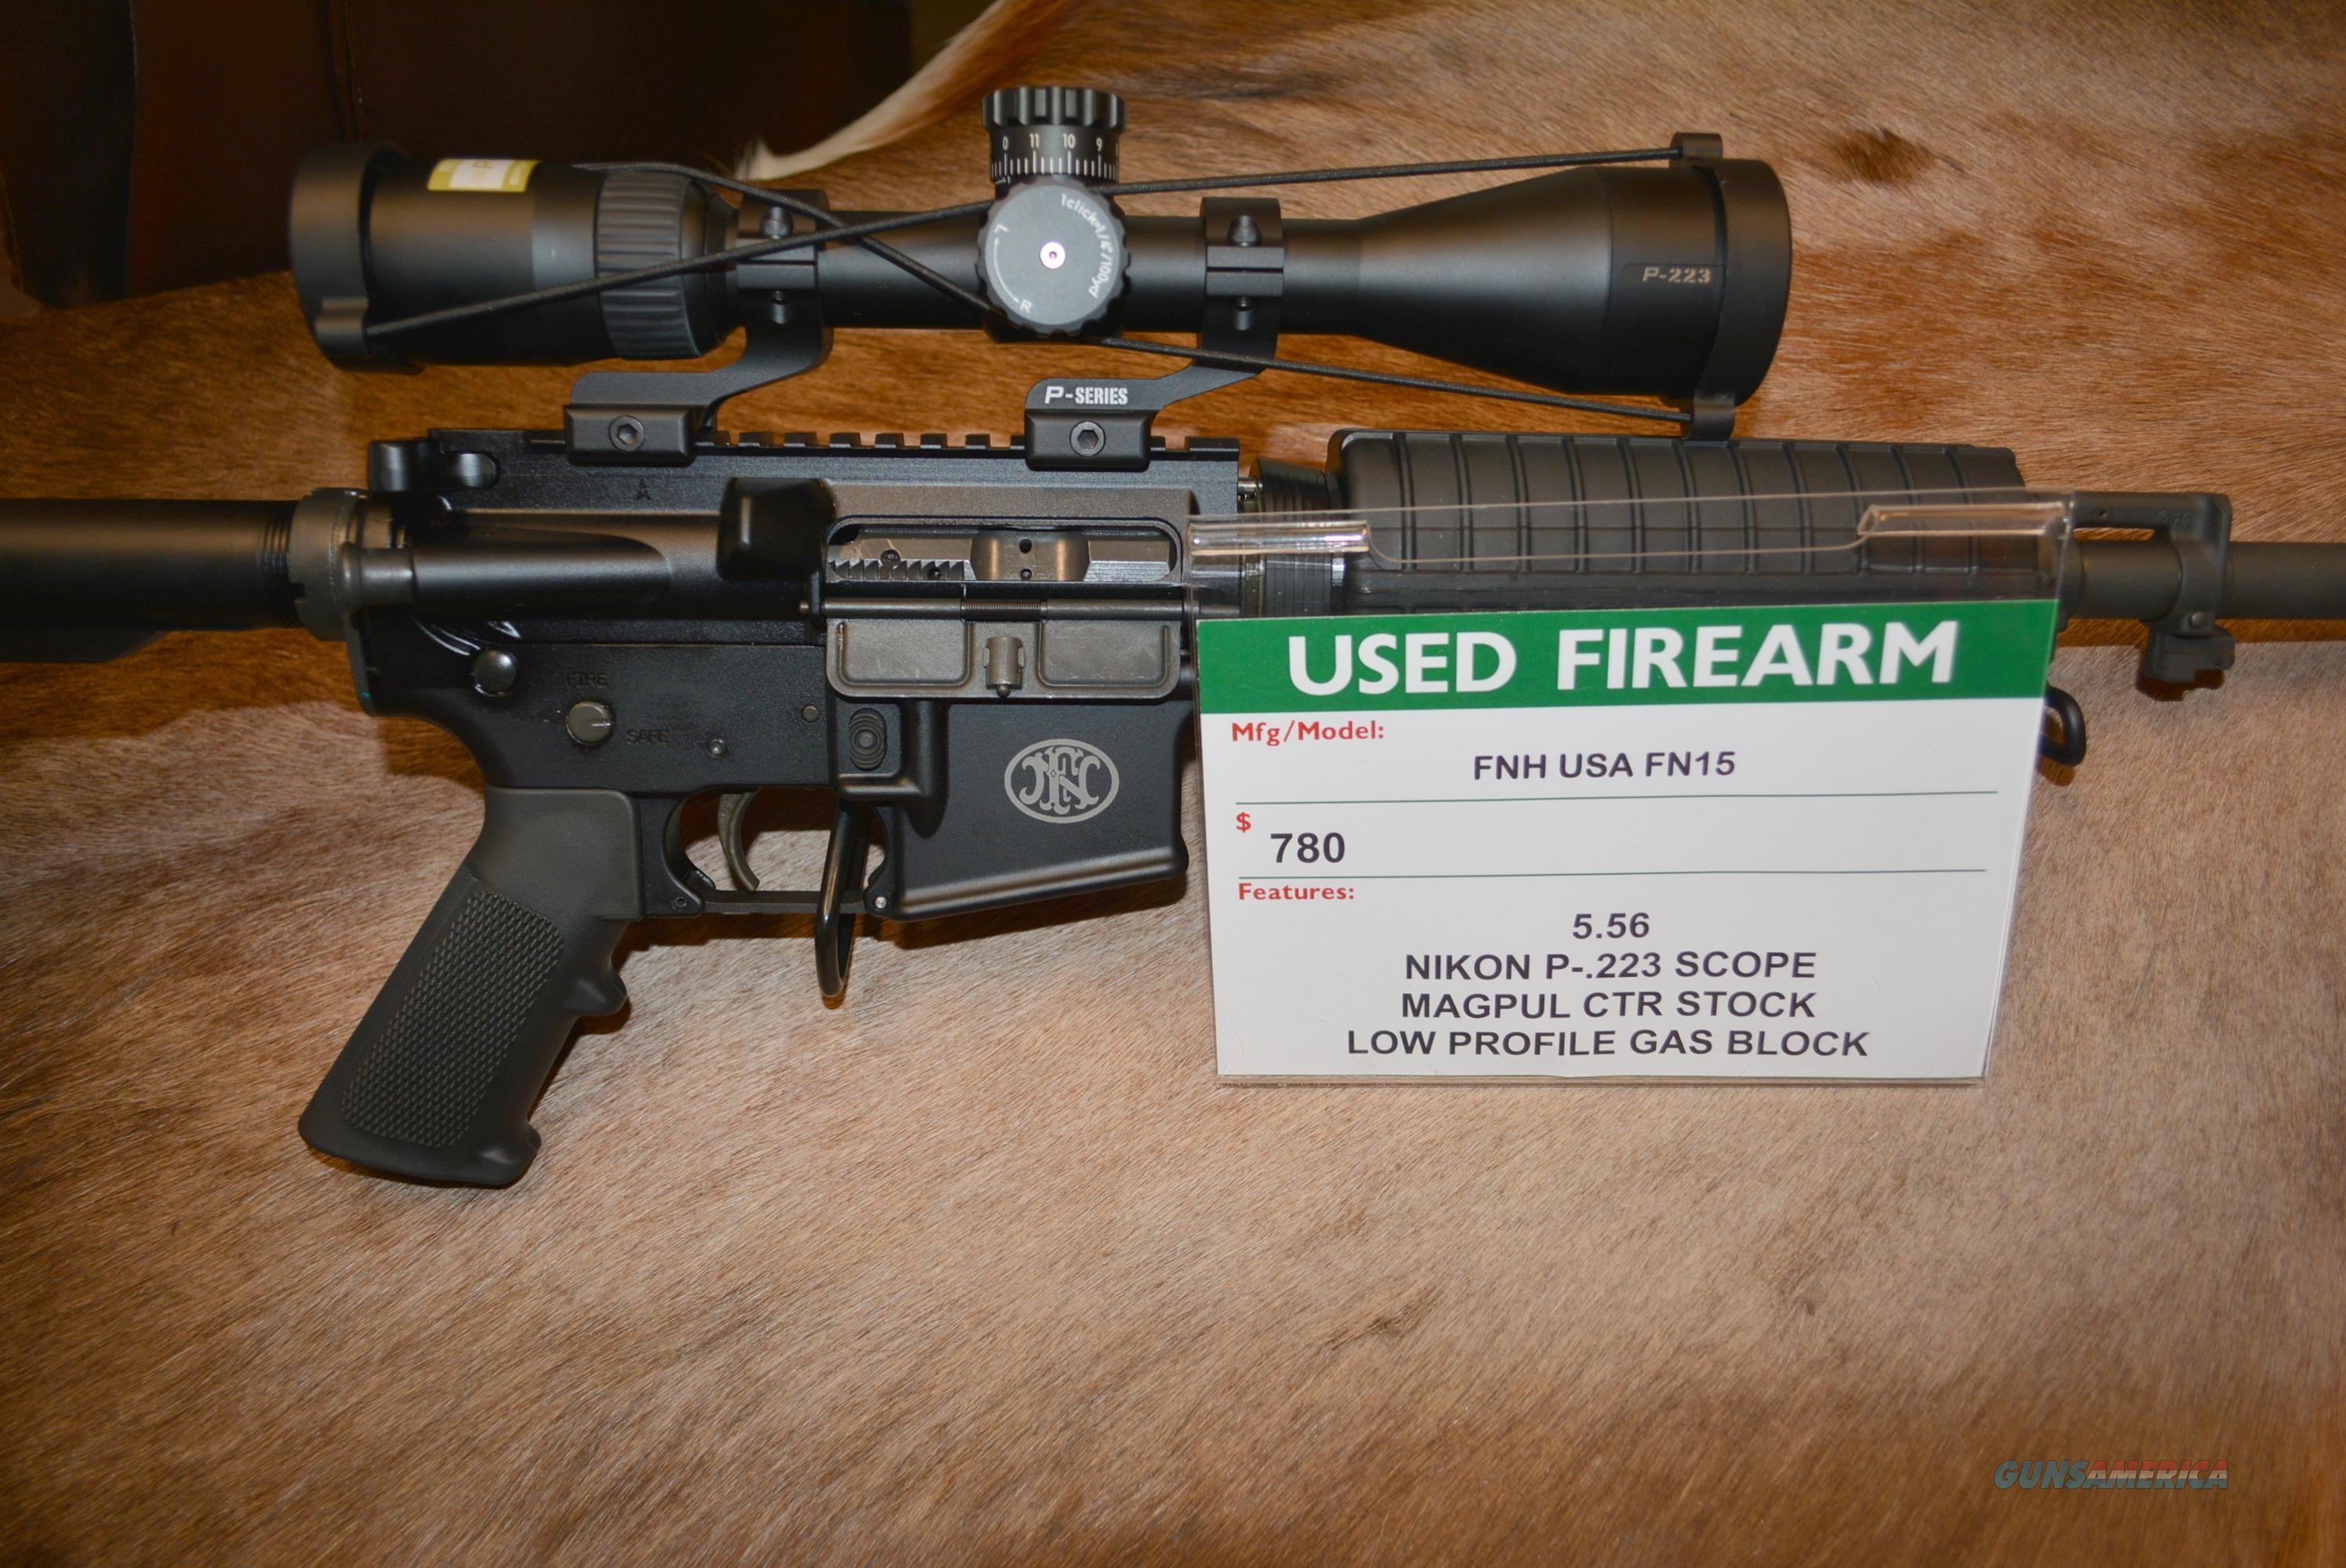 FN FN15 W/Nikon P223 Scope ALL LIKE NEW  Guns > Rifles > FNH - Fabrique Nationale (FN) Rifles > Semi-auto > FN 15